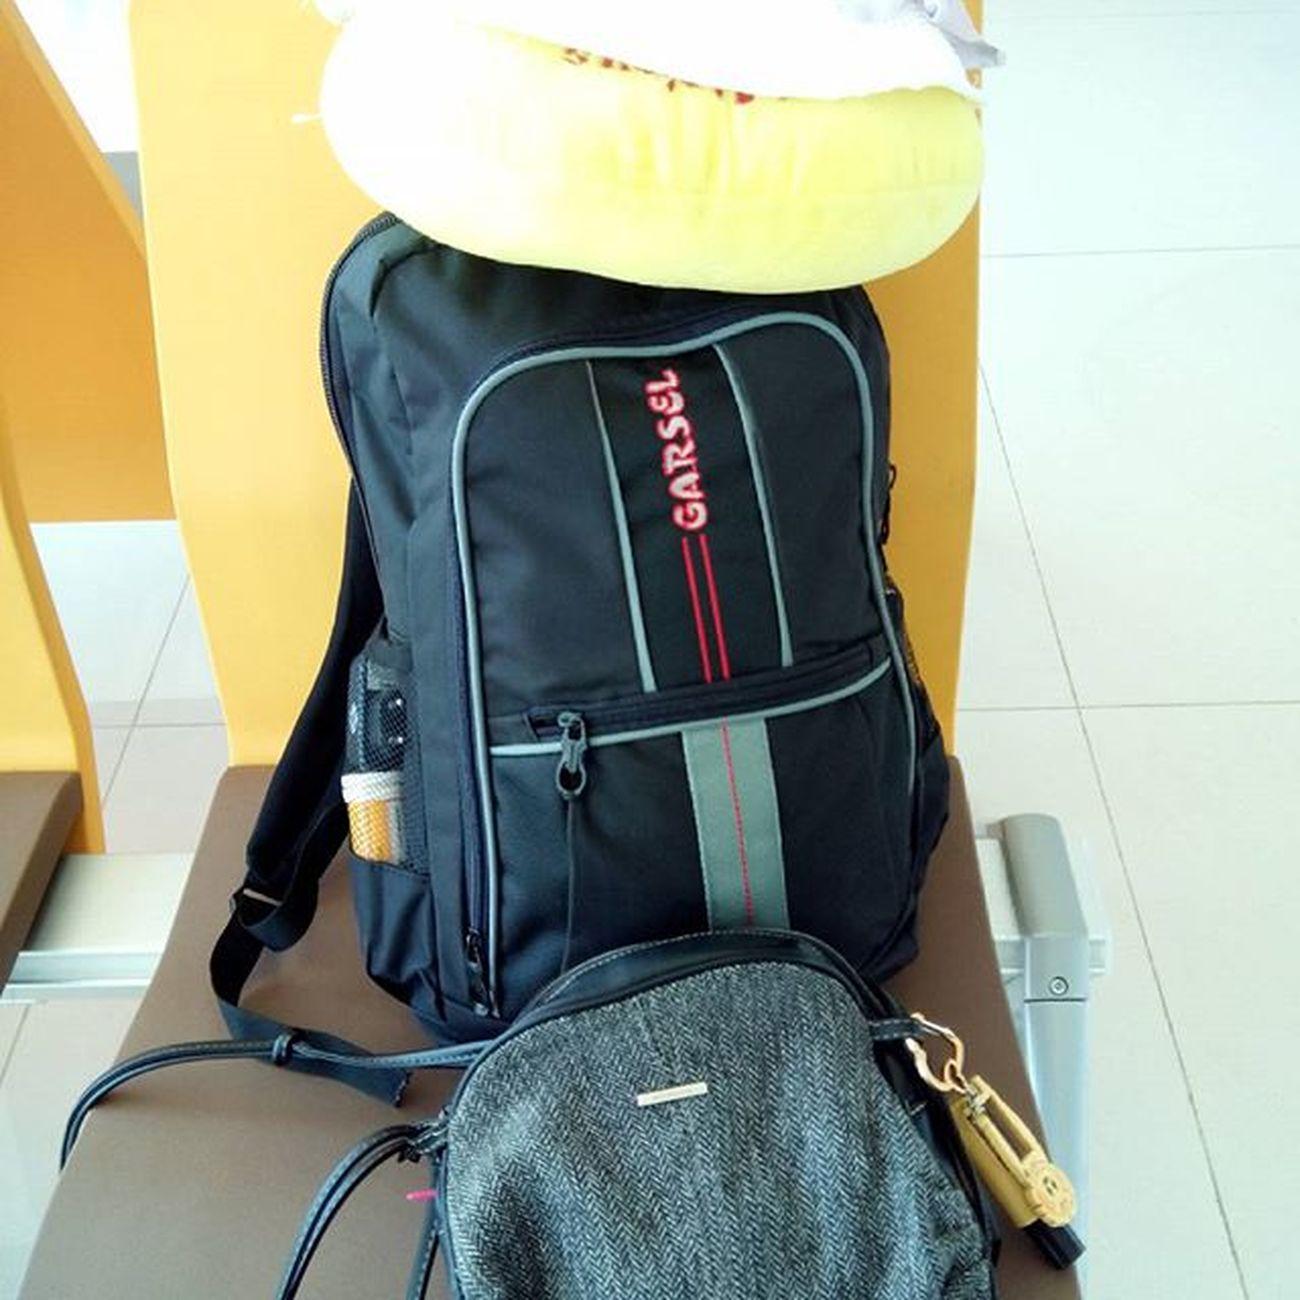 Bismillah, budal disek rekkk Mbambungnekat Traveling Backpacker Djuanda plane